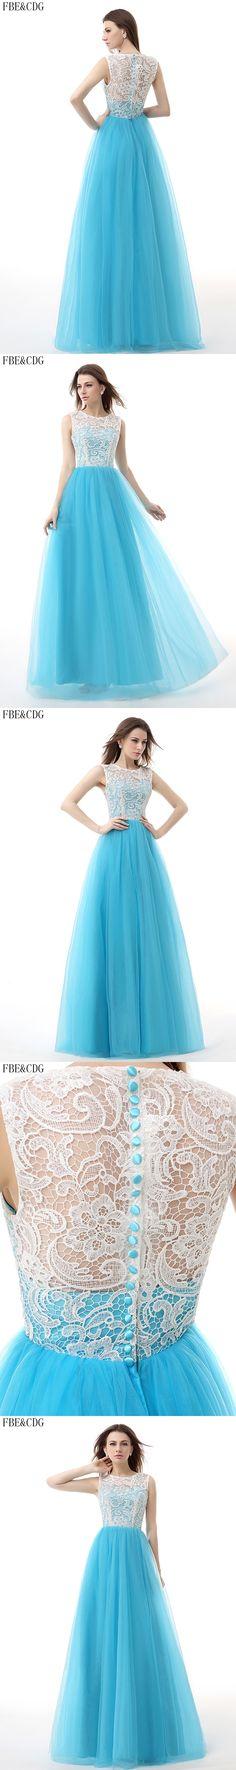 Real Picture Stock Light Blue Long Prom Dresses O -Neck White Lace Tulle Evening Party Dress Boho vestido longo abendkleider